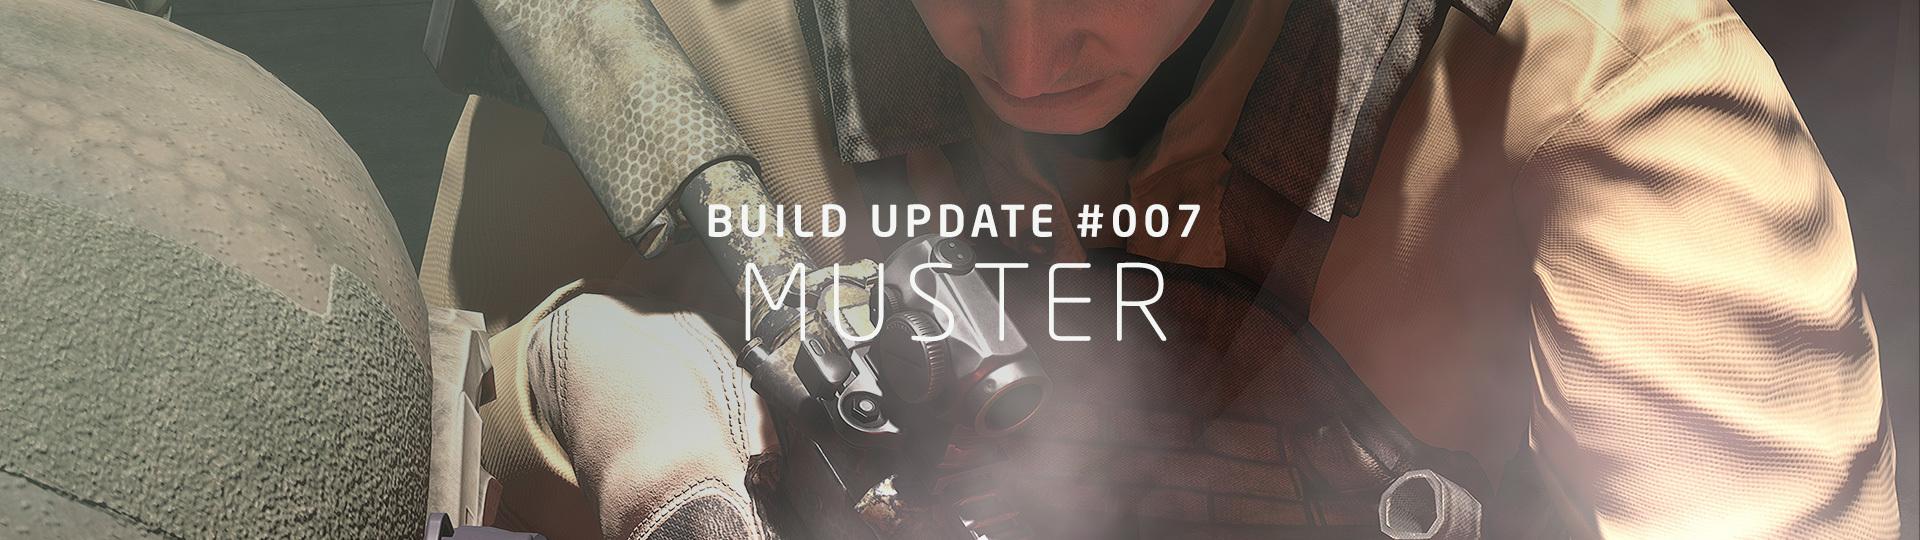 Dec 13, 2018 BUILD UPDATE #007: Muster GROUND